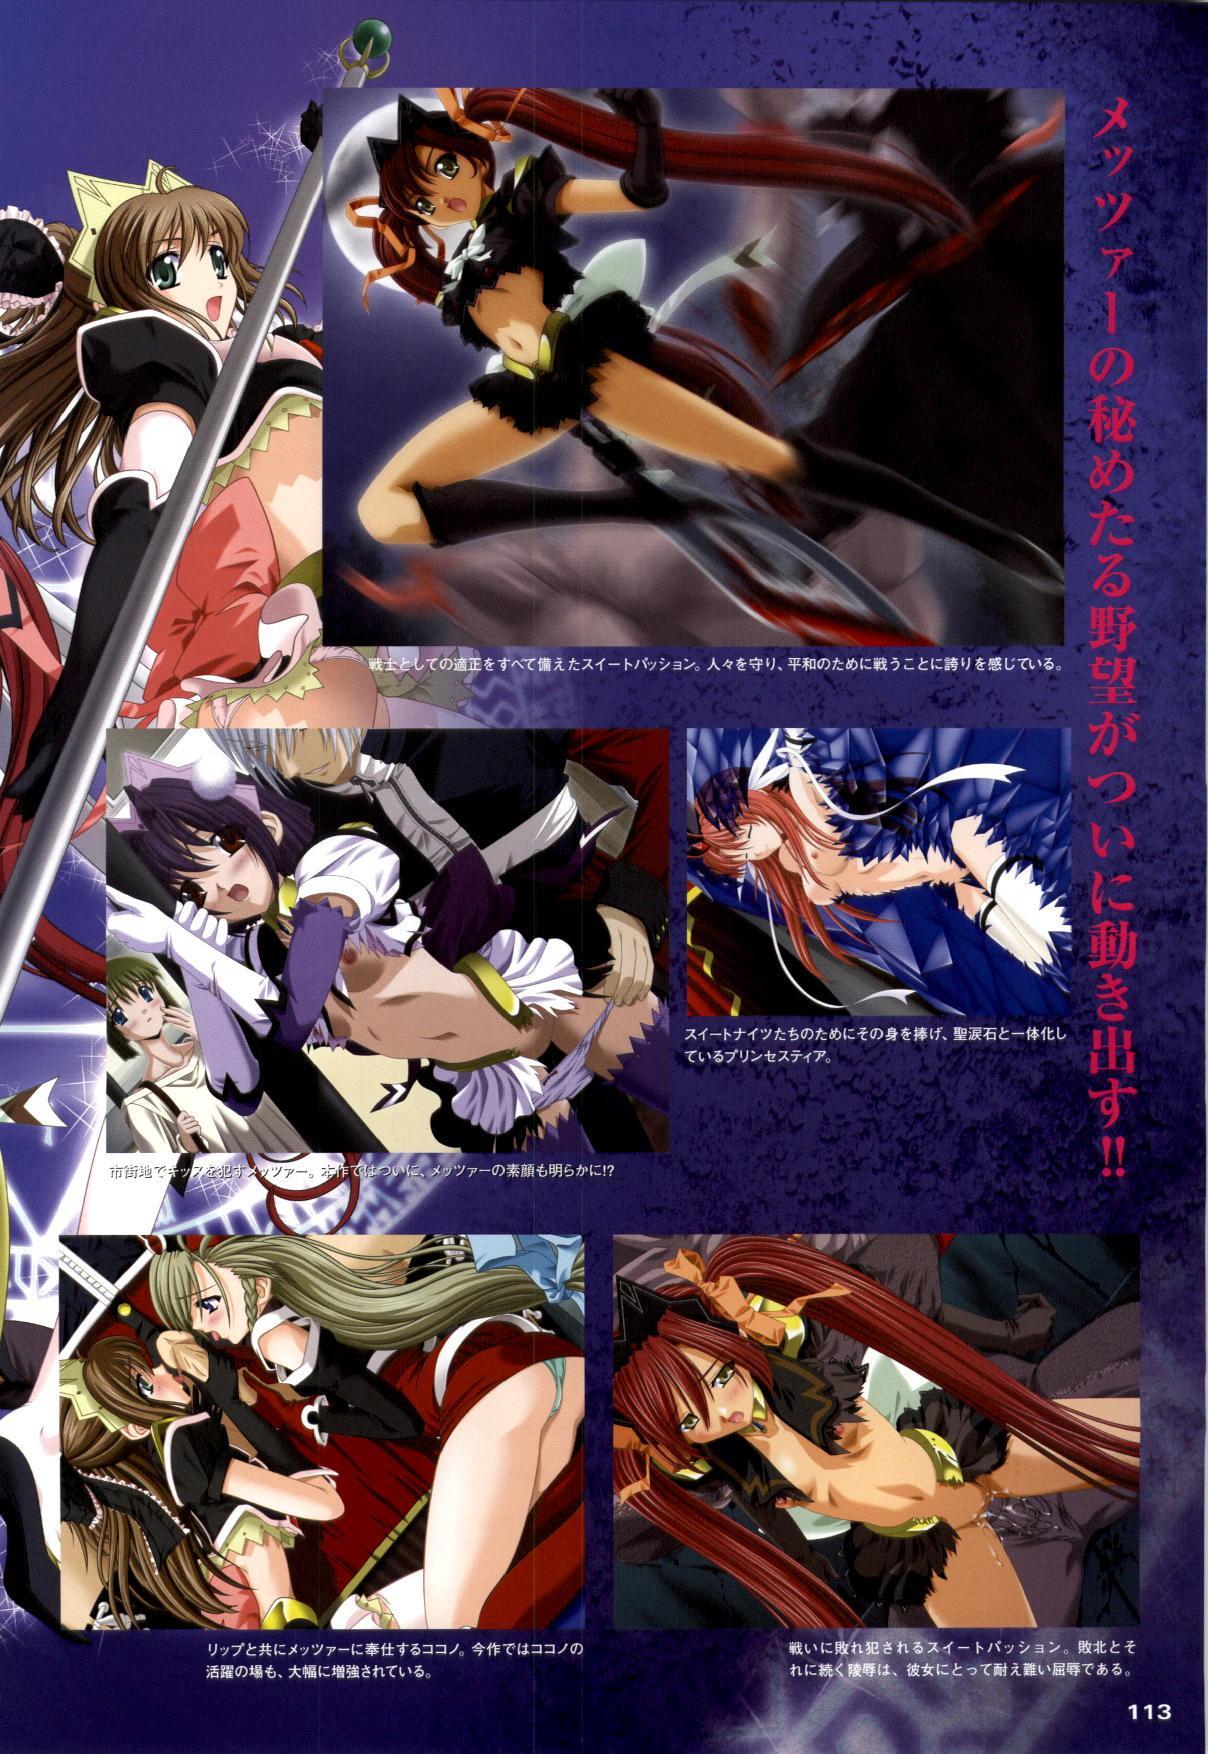 Mahou Senshi Sweet Knight & Mahou Senshi Princess Tear 112